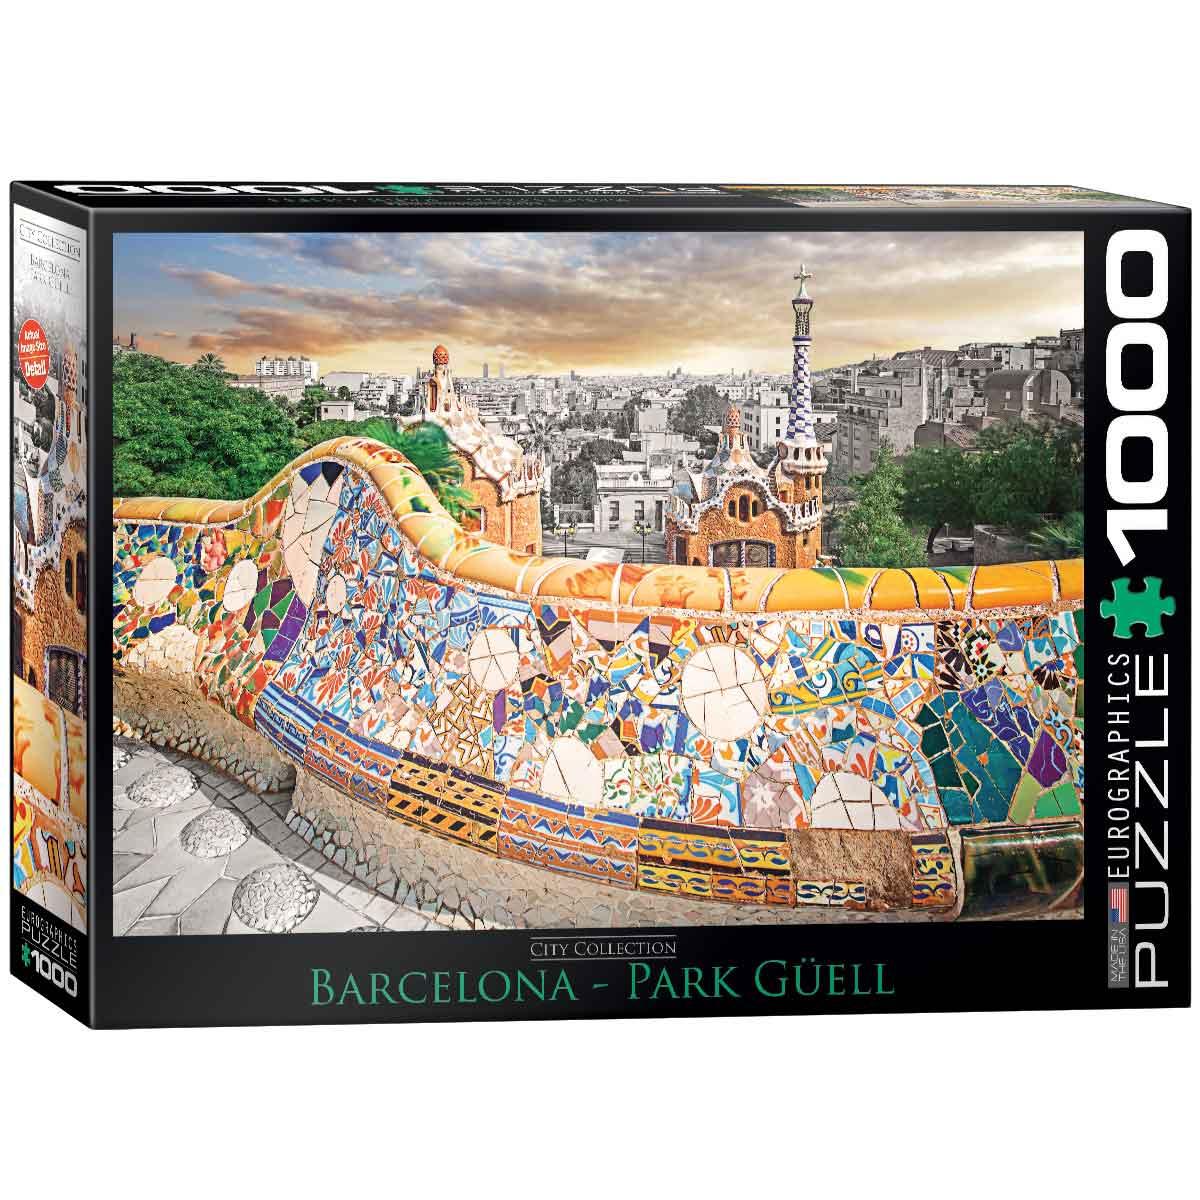 Puzzle Eurographics Parque Güell, Barcelona de 1000 Piezas